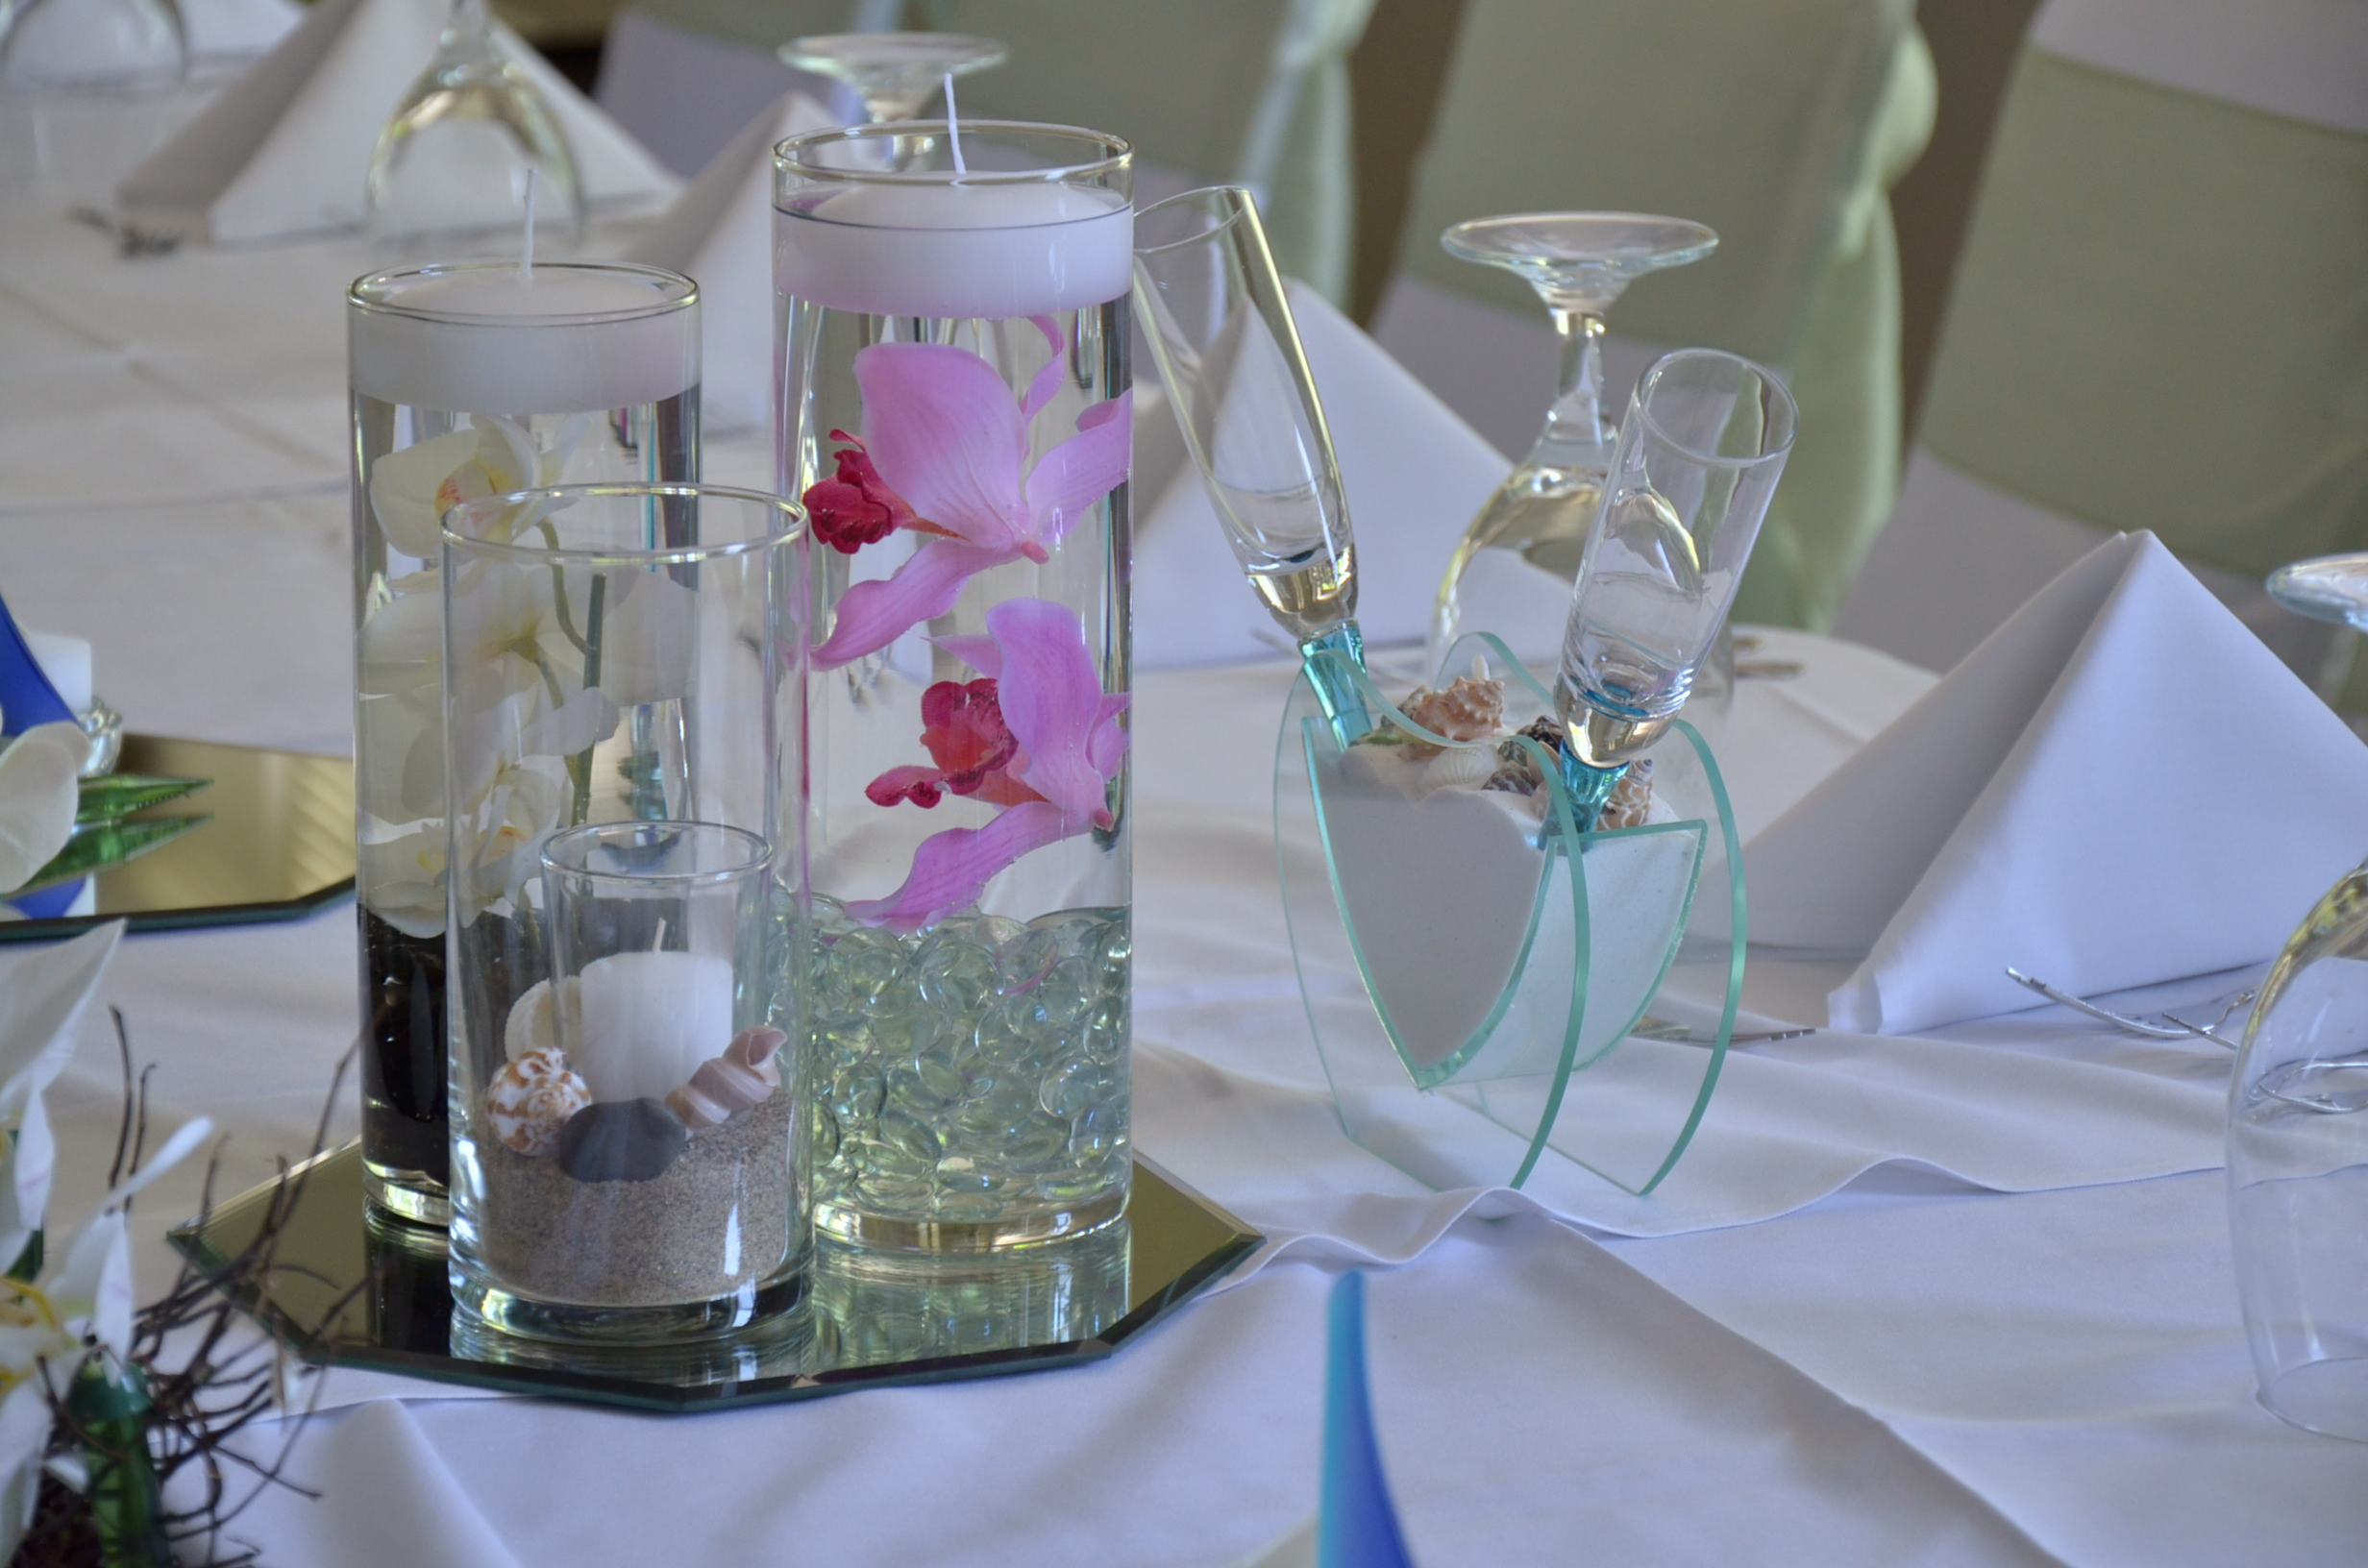 Wedding Reception Table Centerpiece Ideas